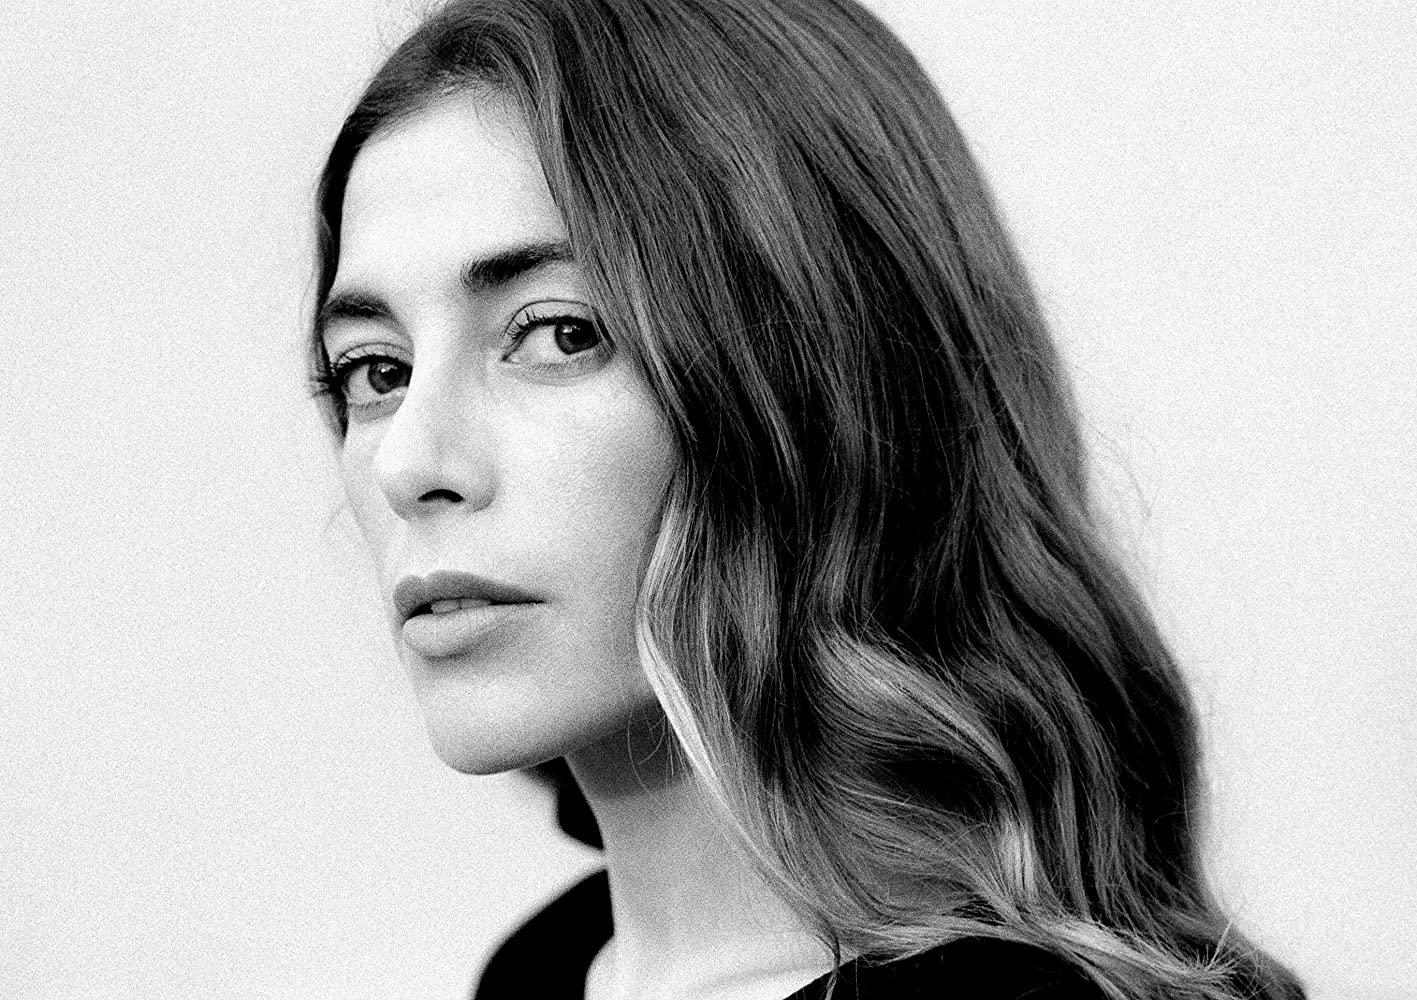 Valeria Vereau Spanish Actress, Producer